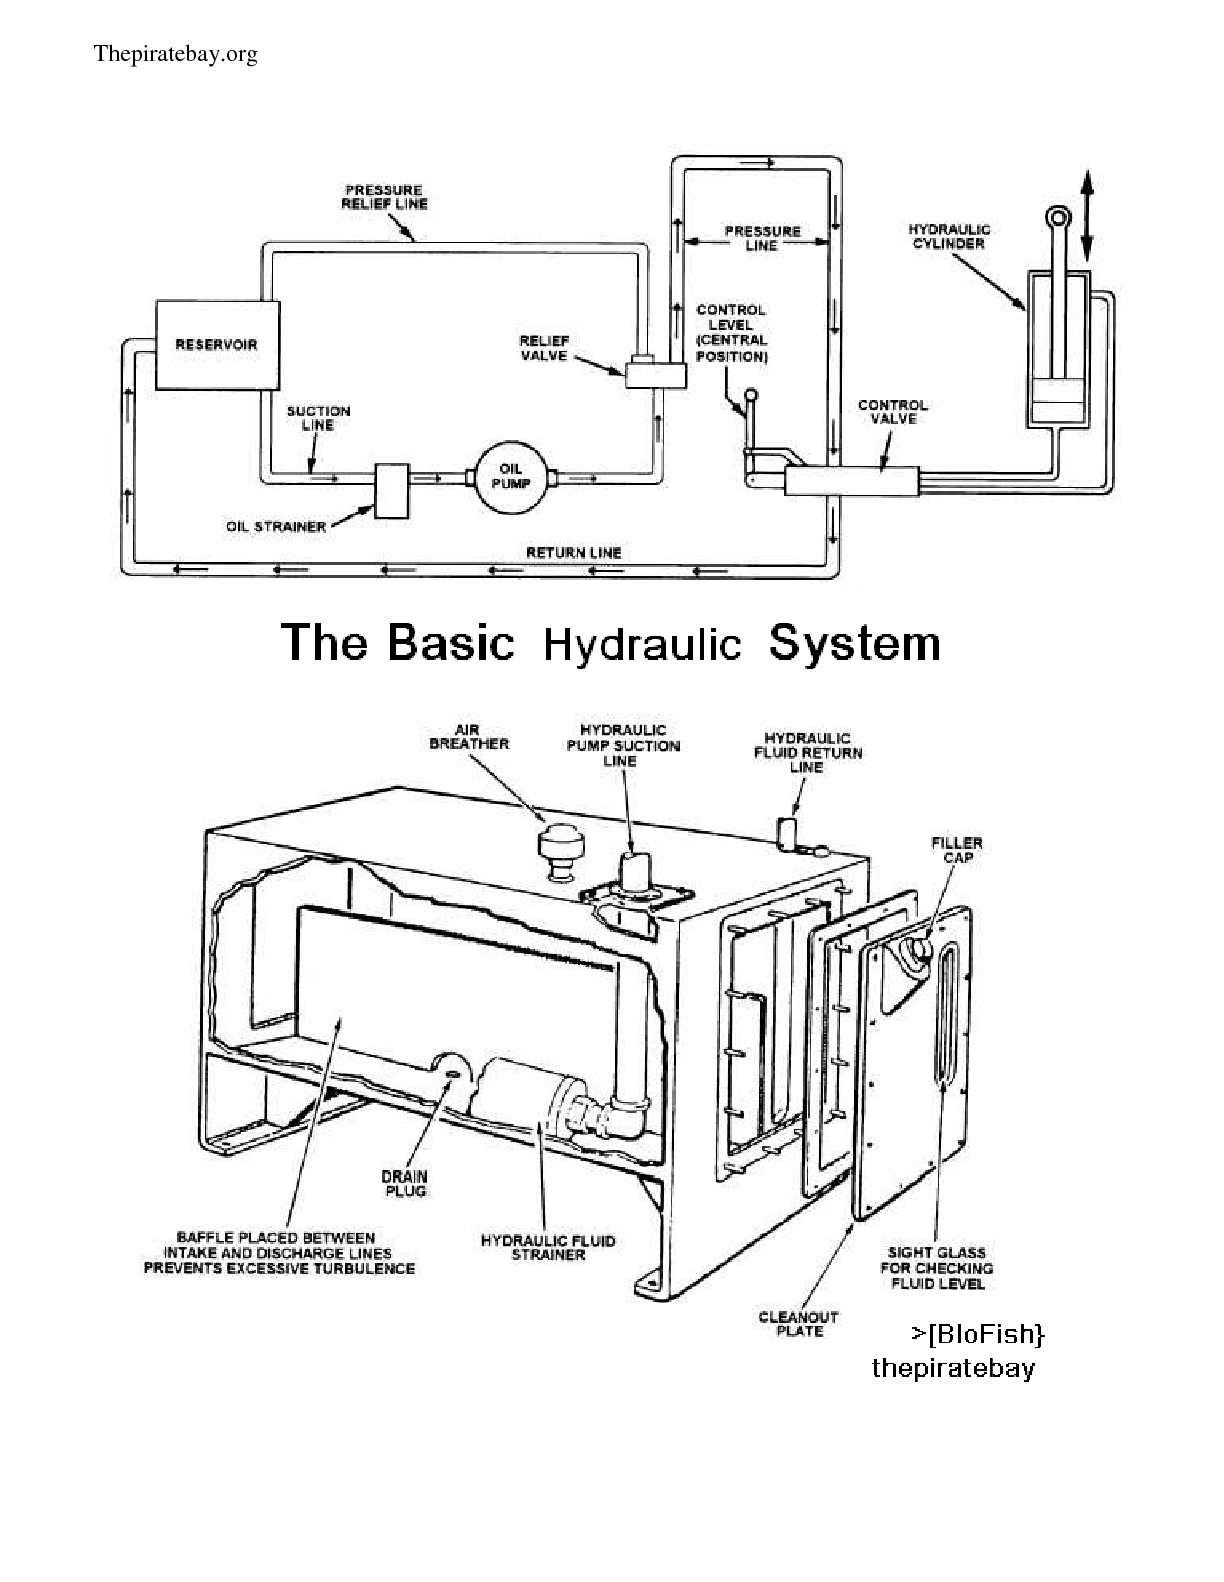 Calamo Basics Of Hydraulic Systems John Deere 214 Mower Deck Belt Diagram Car Interior Design